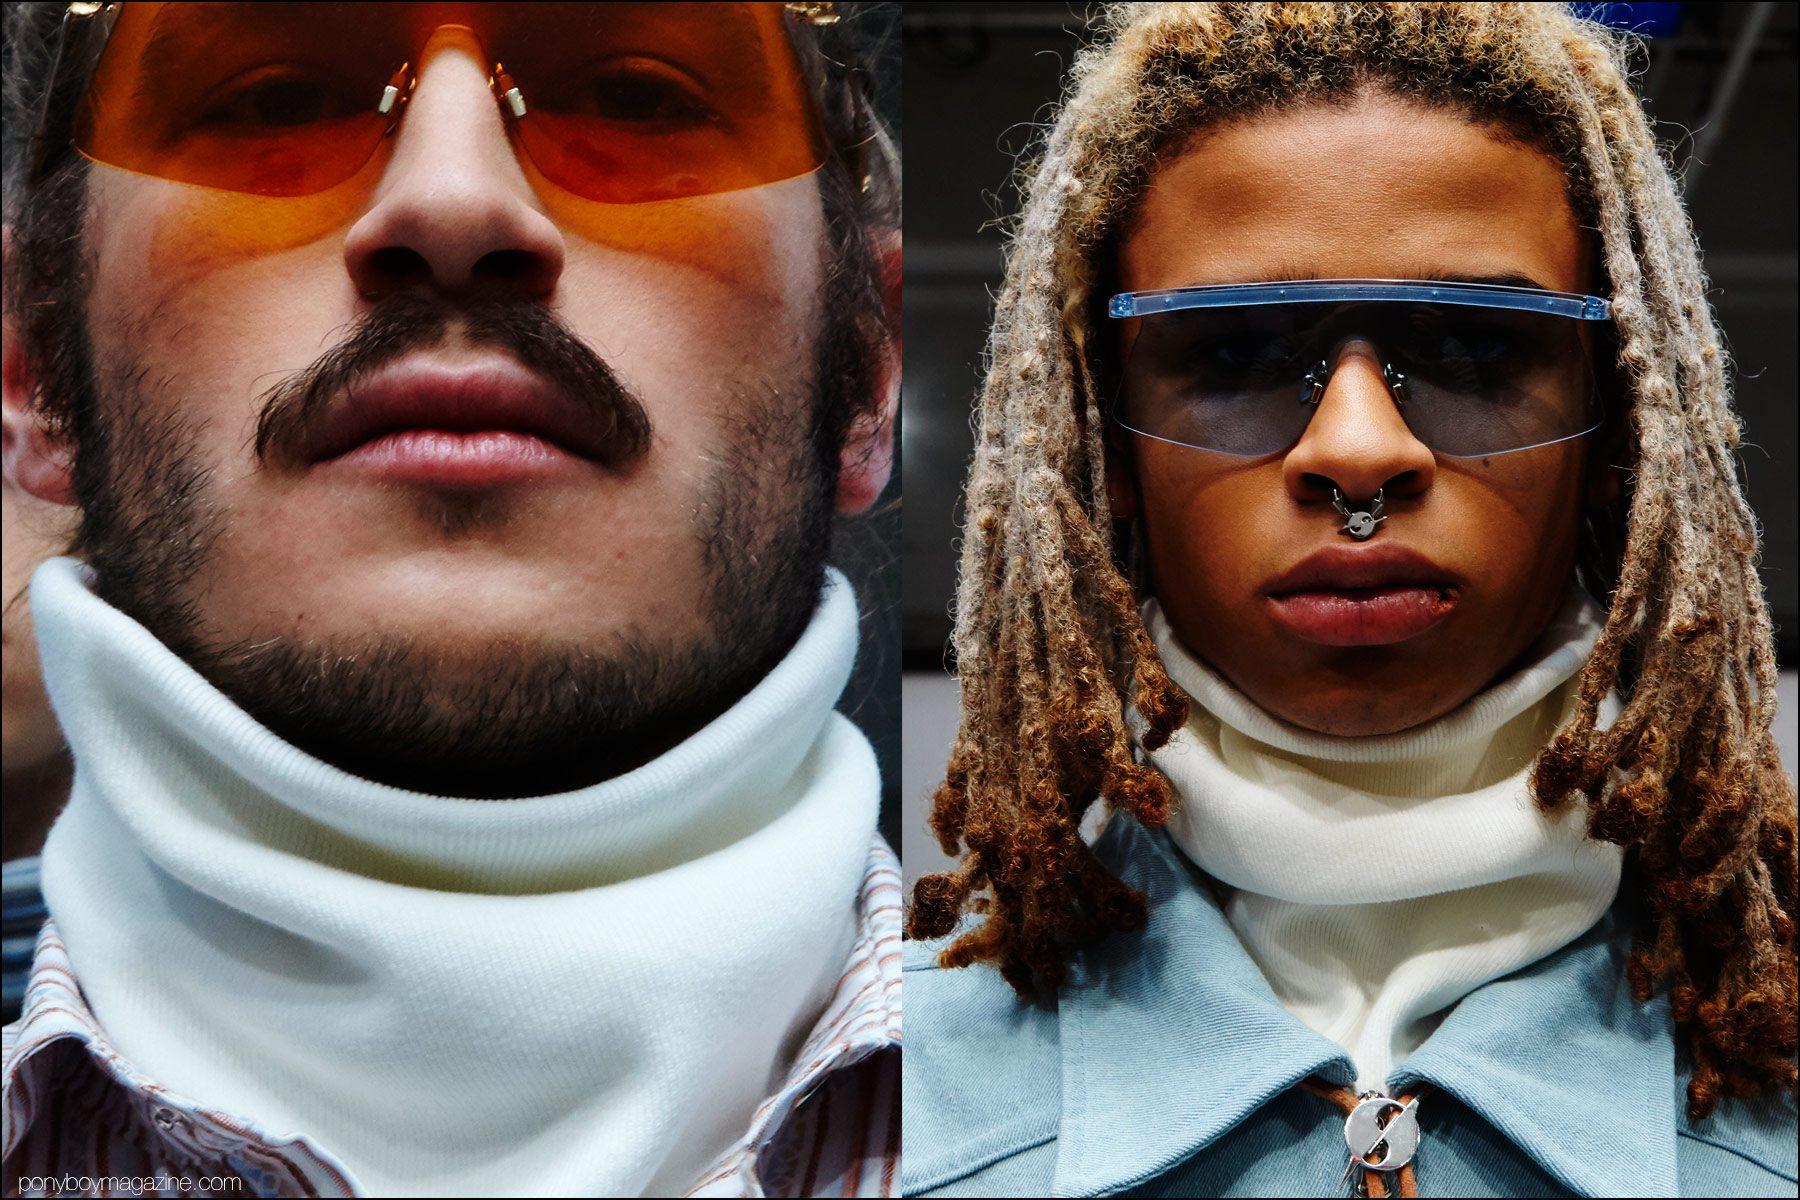 Sleek sunglasses photographed at Gyspy Sport F/W16 menswear presentation. Photography by Alexander Thompson for Ponyboy magazine NY.